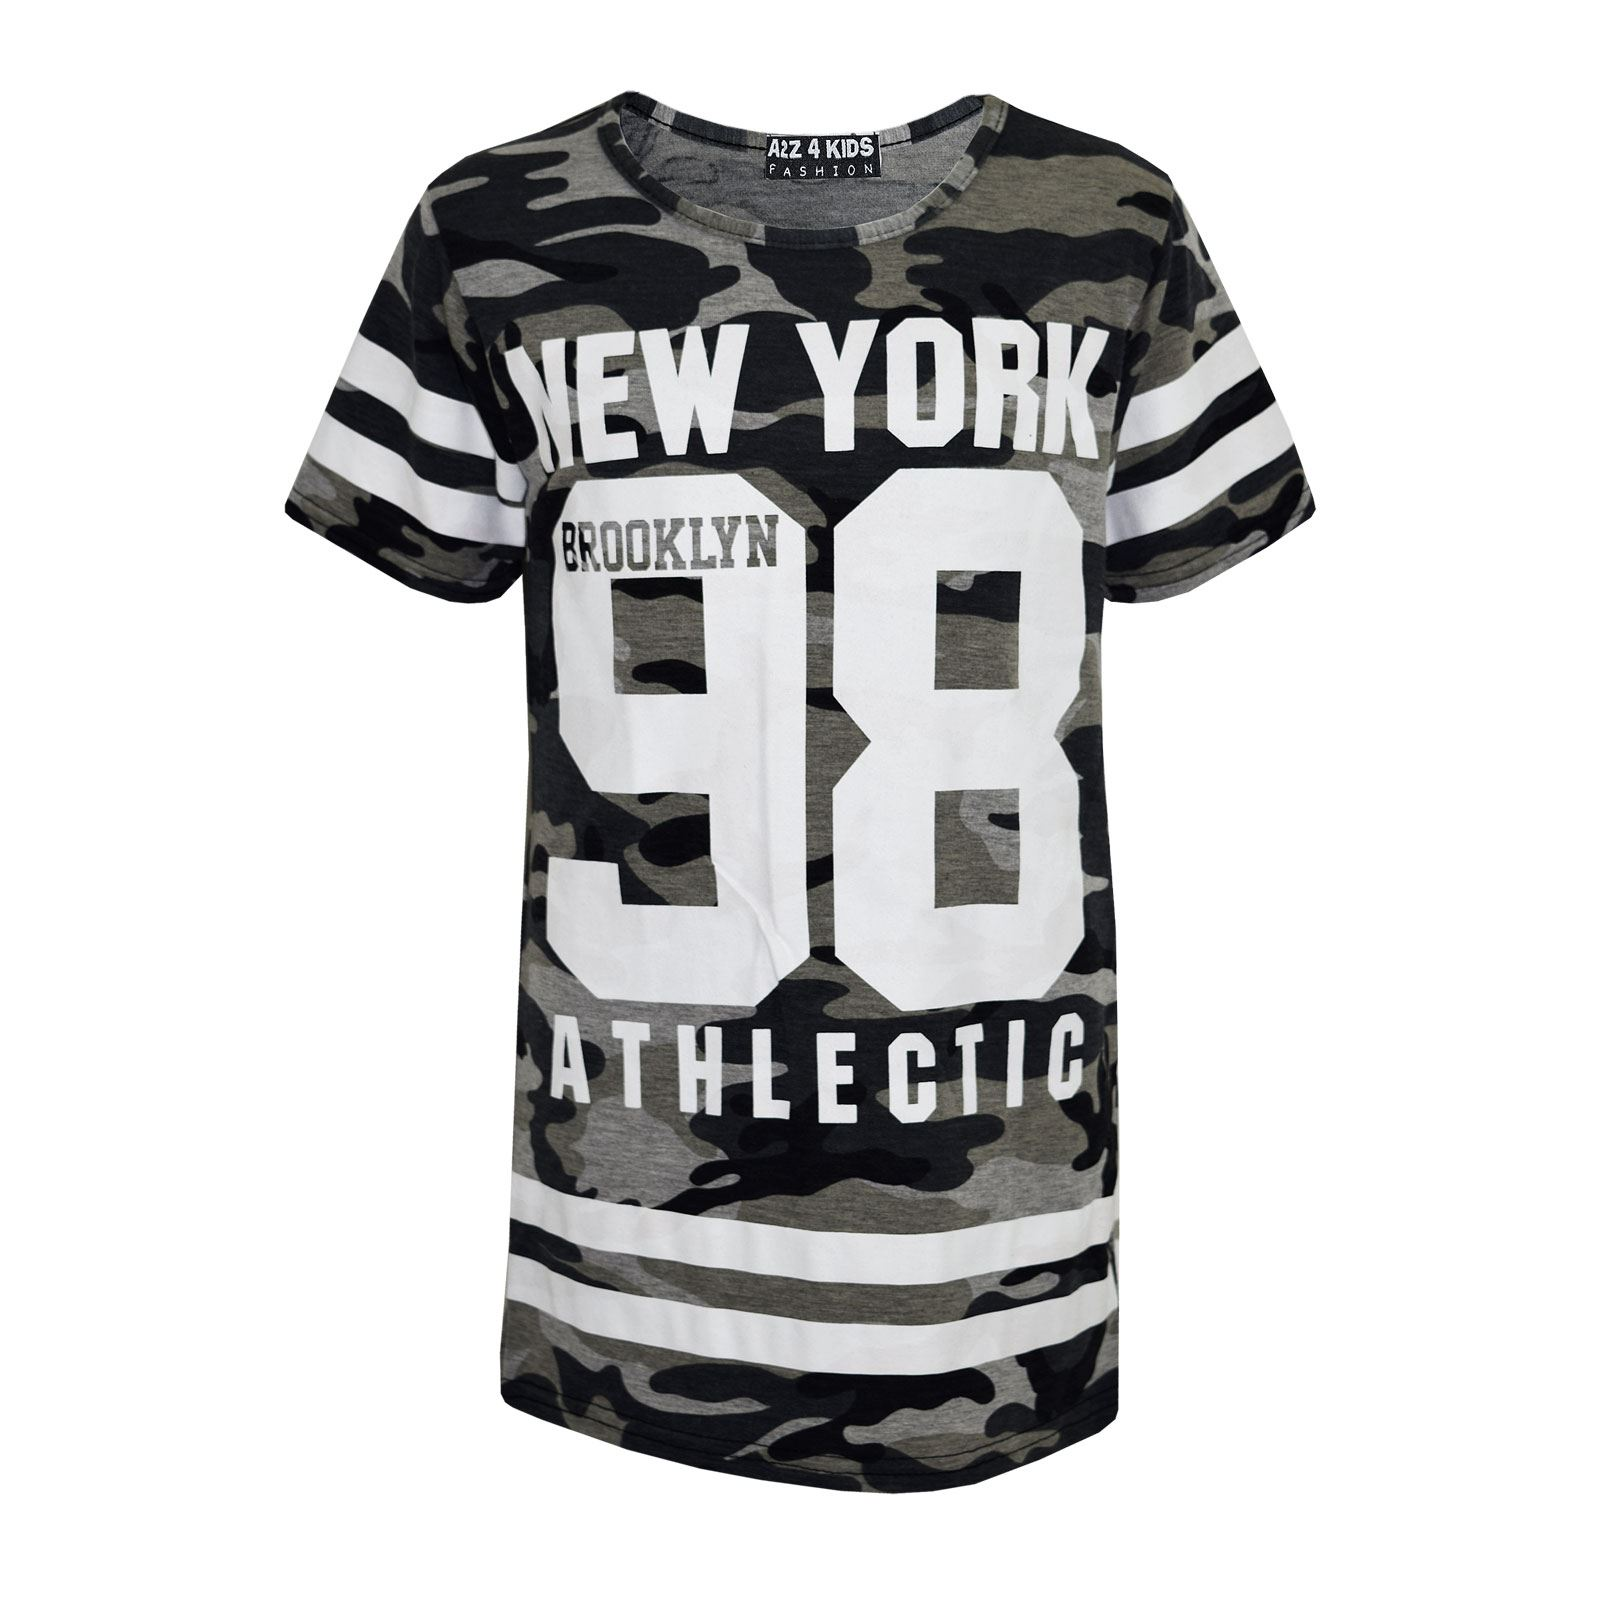 Girls-NEW-YORK-BROOKLYN-98-ATHLECTIC-Camouflage-Print-Top-amp-Legging-Set-7-13-Yr thumbnail 17